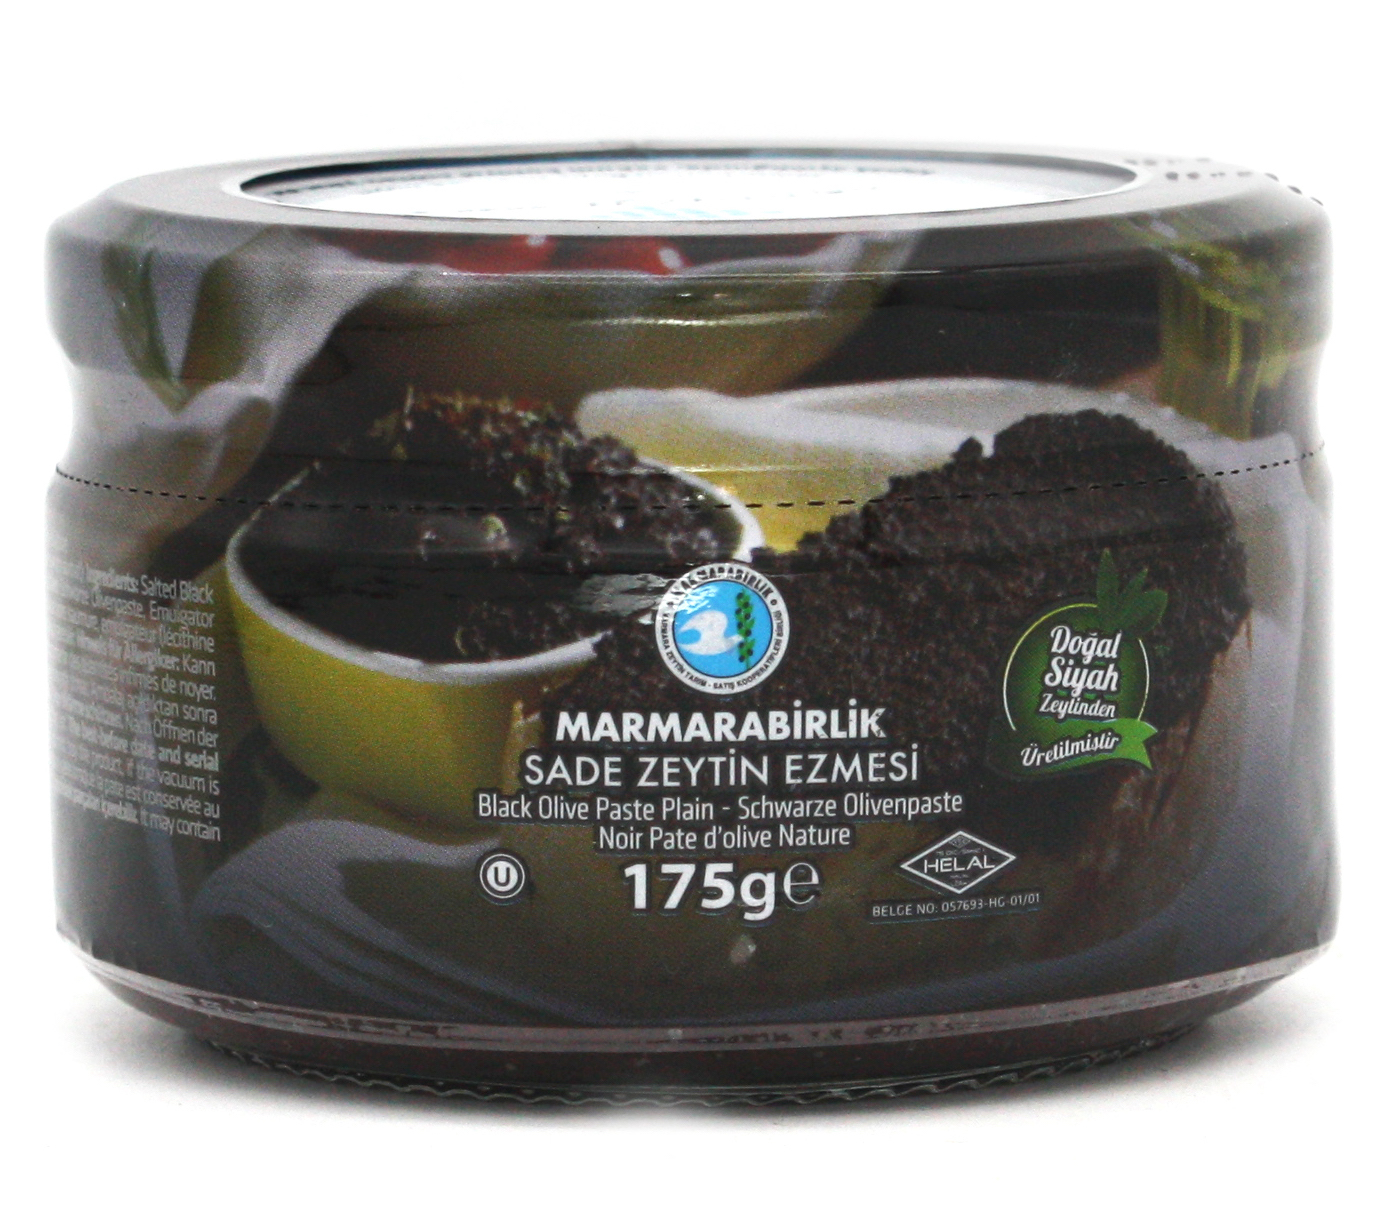 Оливки и оливковая паста Оливковая паста черная без специй, Marmarabirlik, 175 г import_files_b1_b1a88977765d11e9a9ac484d7ecee297_b1a88979765d11e9a9ac484d7ecee297.jpg